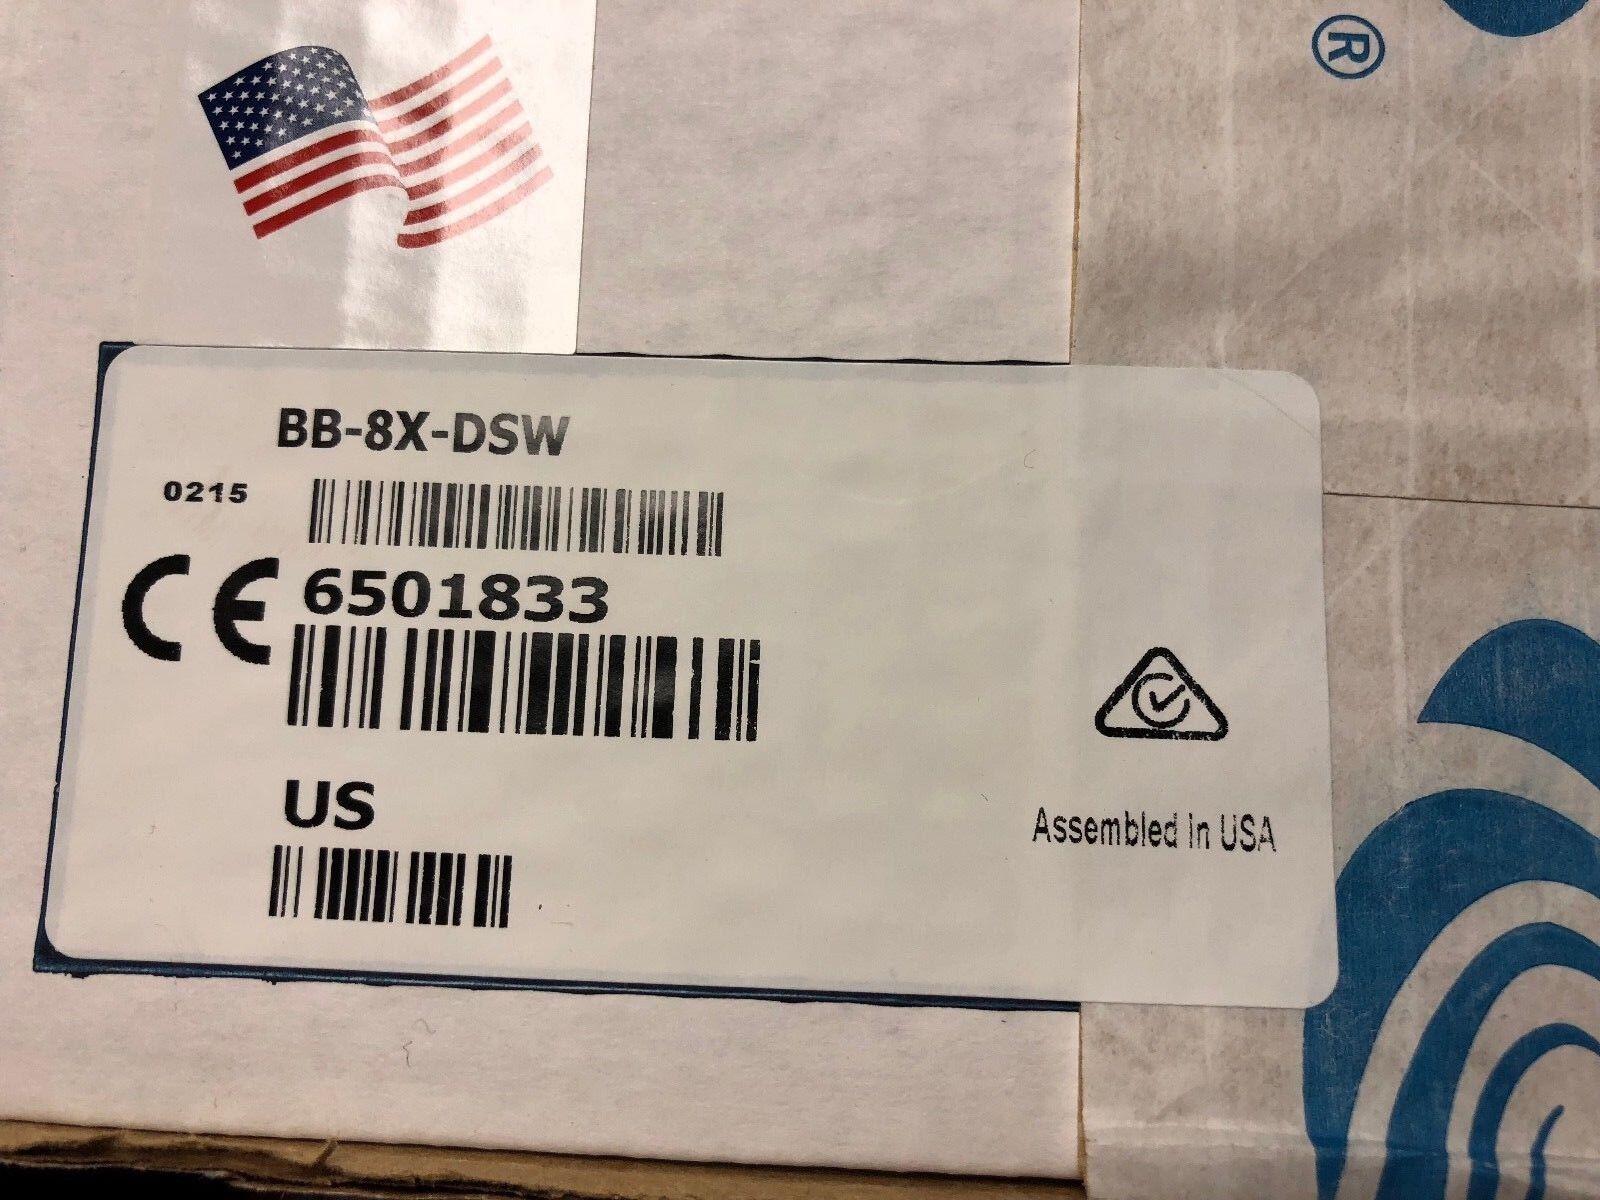 Crestron Back Box for TPMC-8X-DSW Brand New in Box Model BB-8X-DSW